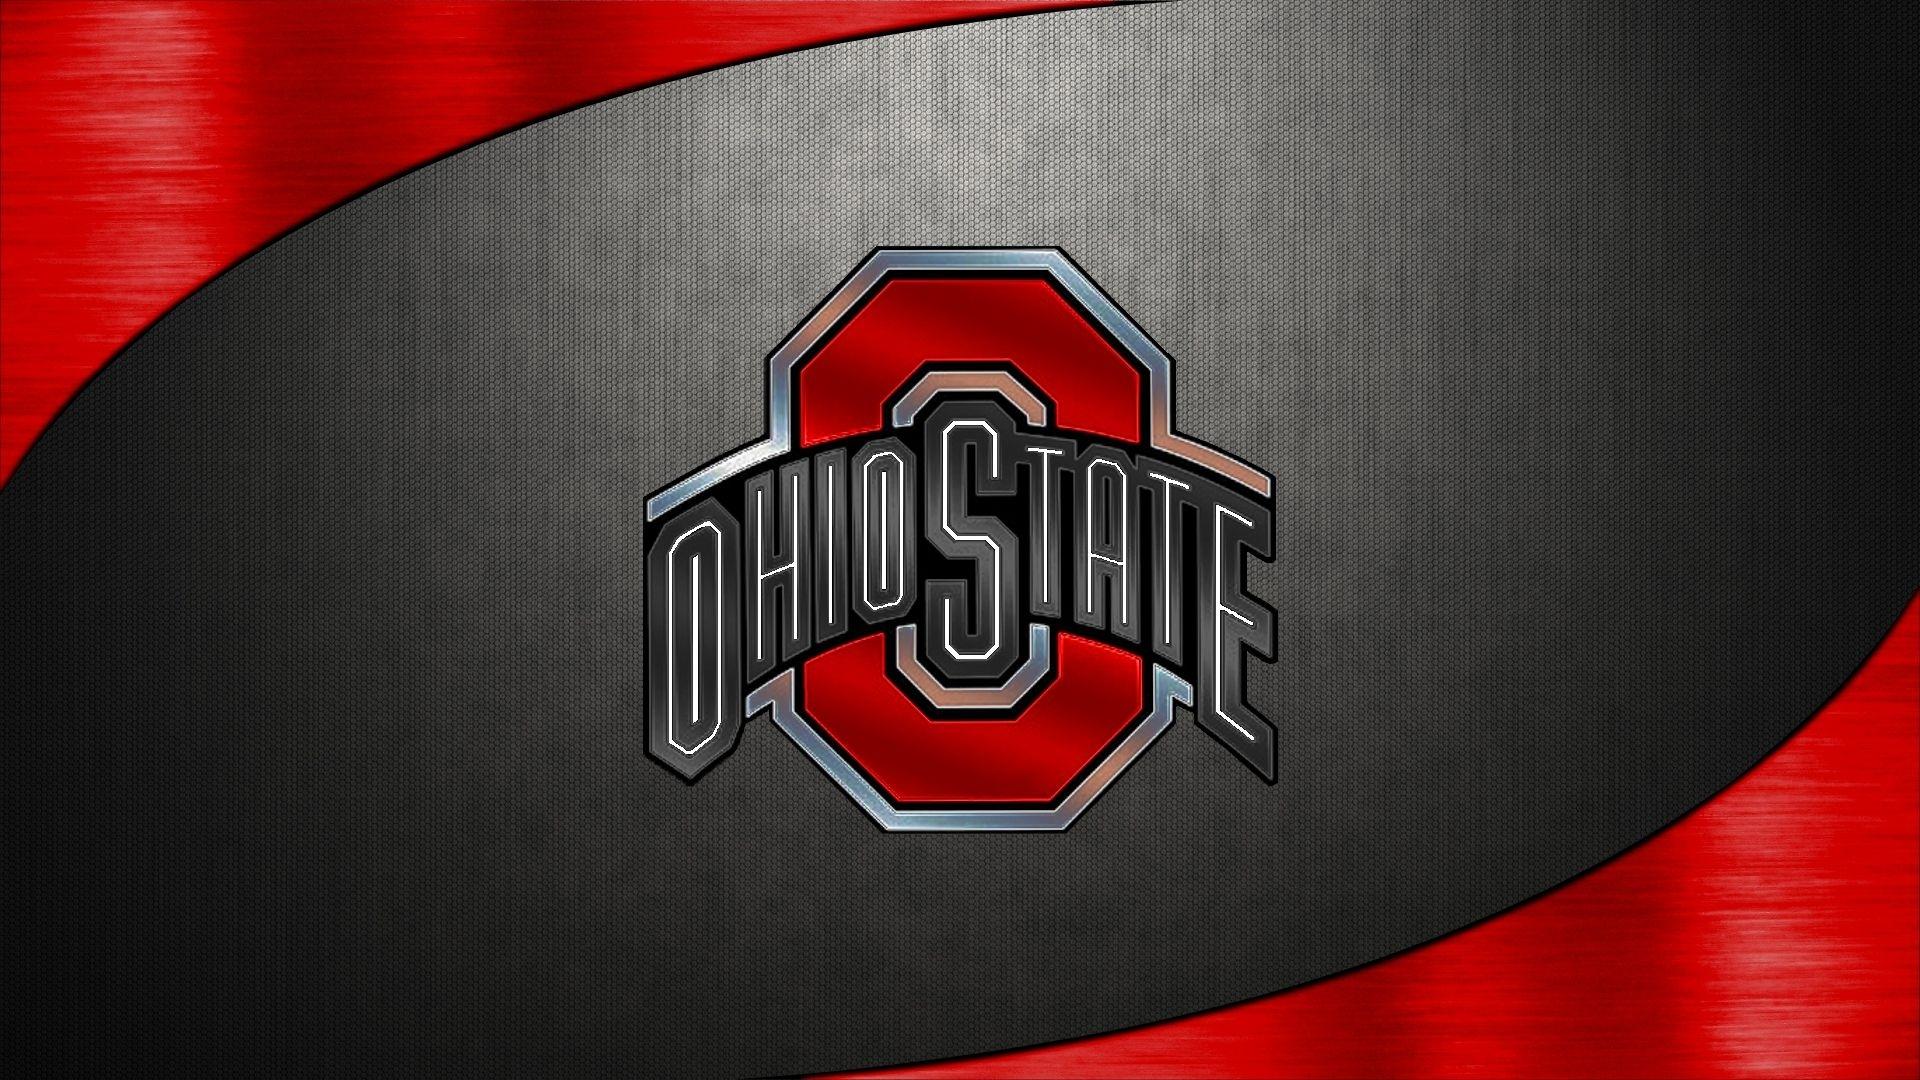 osu wallpaper 447 - ohio-state-football wallpaper | ohio state